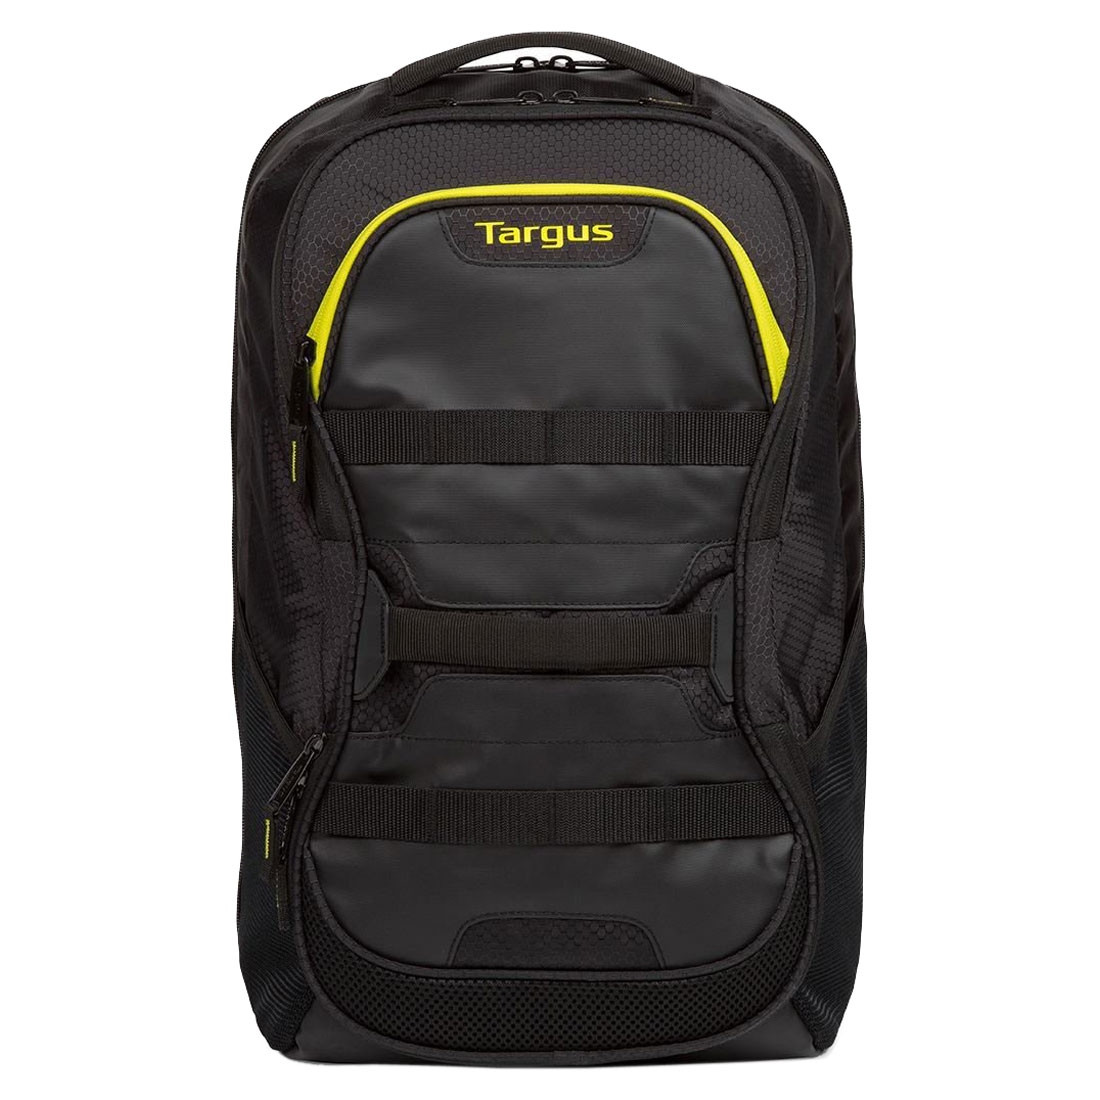 targus work play fitness noir sac sacoche housse targus sur. Black Bedroom Furniture Sets. Home Design Ideas